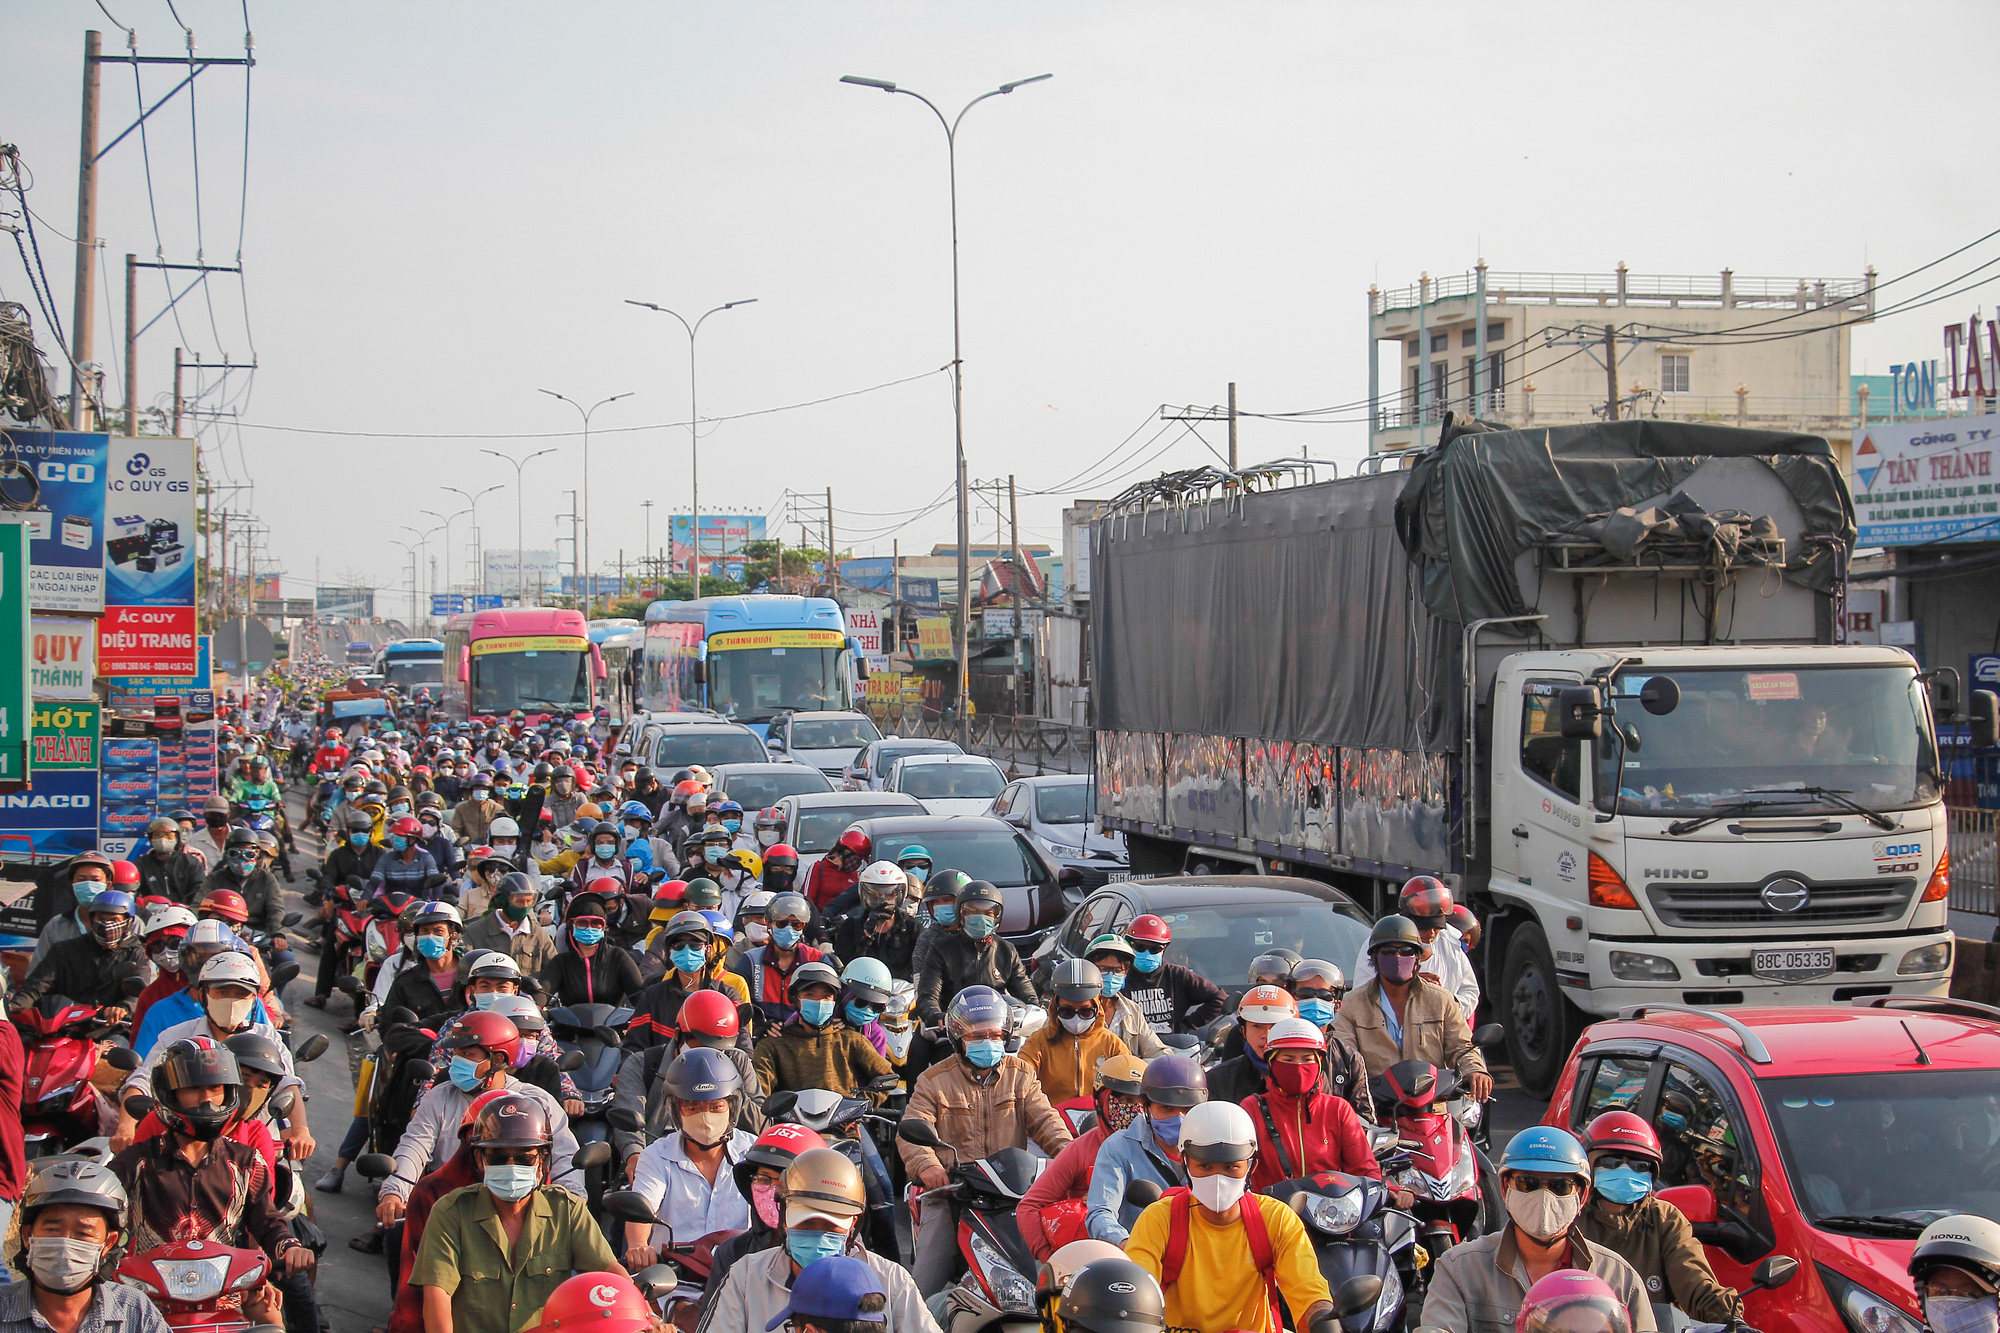 Congestion along National Highway 1 leading to Ho Chi Minh City, May 3, 2020. Photo: Chau Tuan / Tuoi Tre